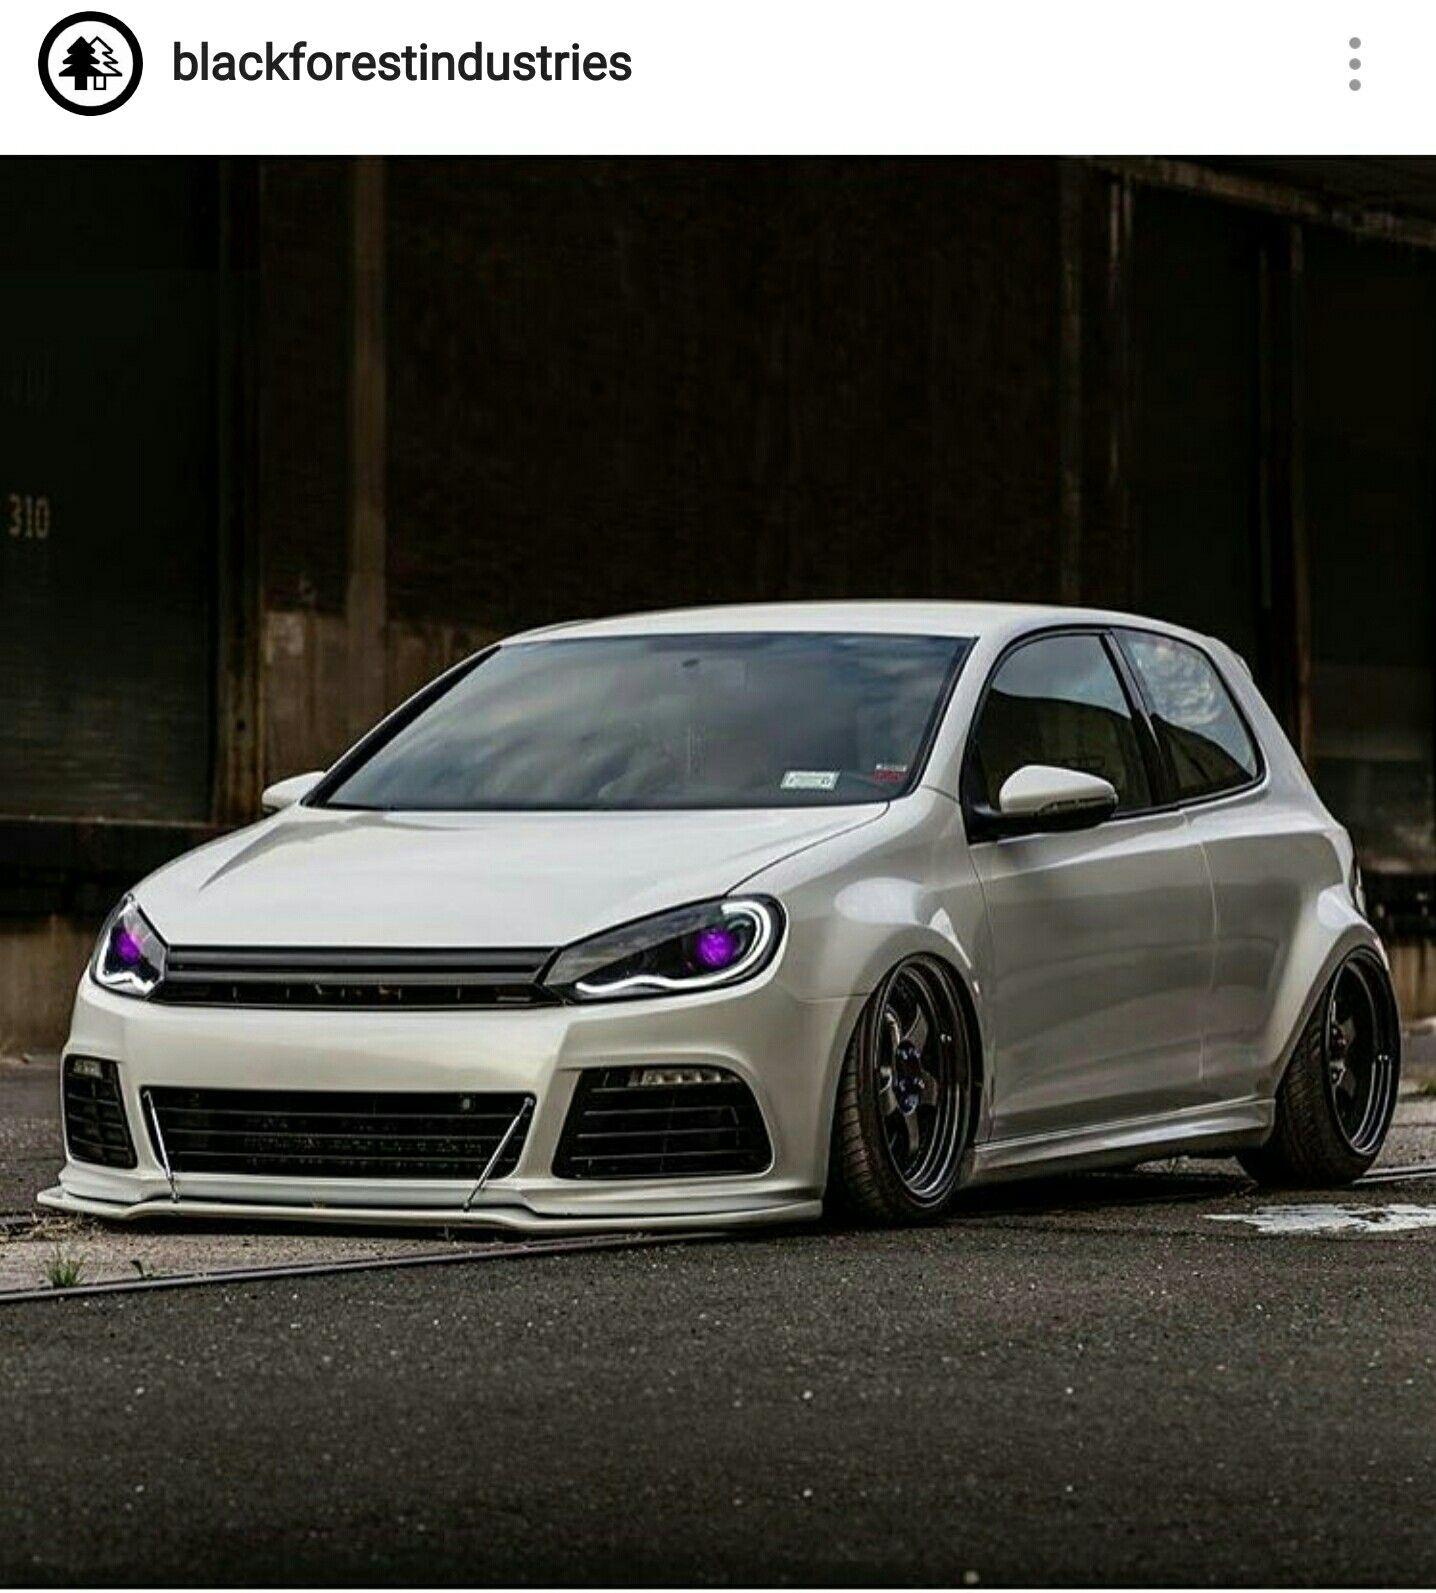 Vw Golf Gti Mk6 Volkswagen Golf Mk6 Gti Golf Gti